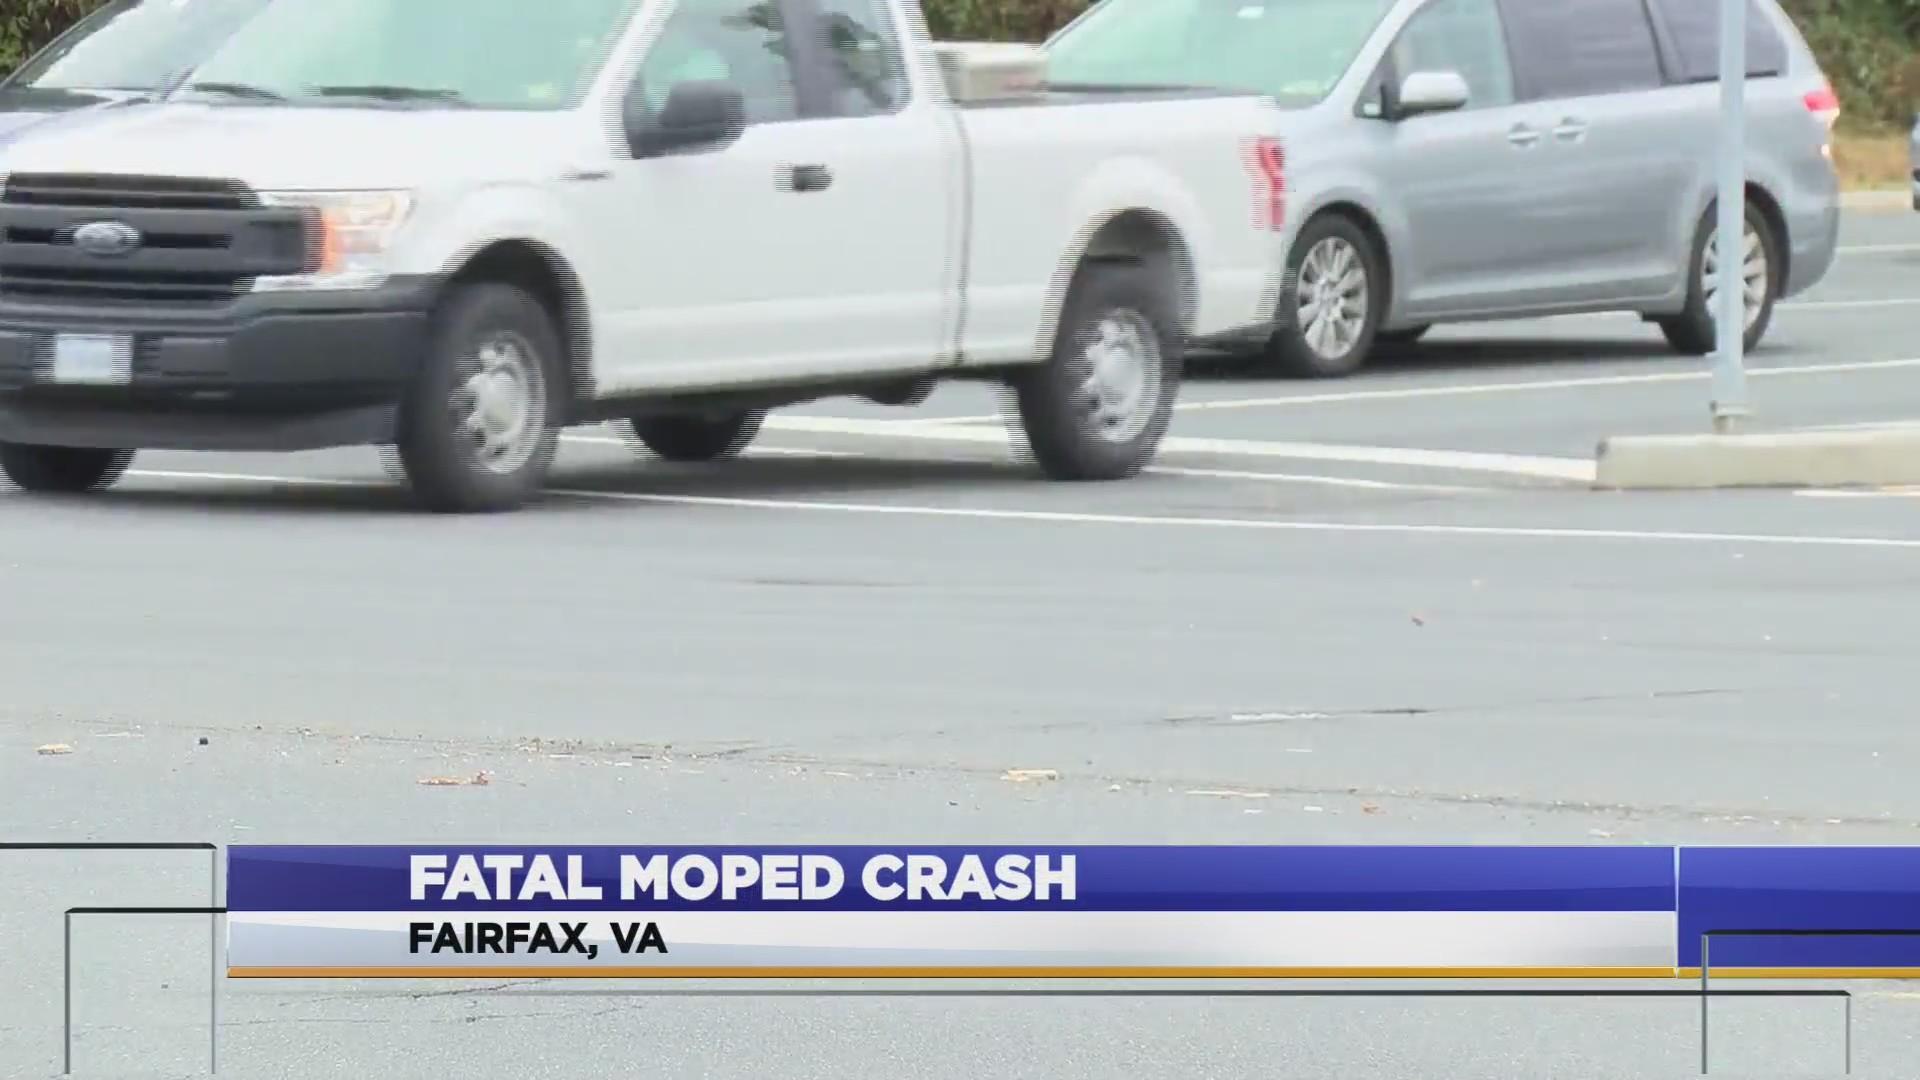 Fatal_moped_crash_1_20181107221843